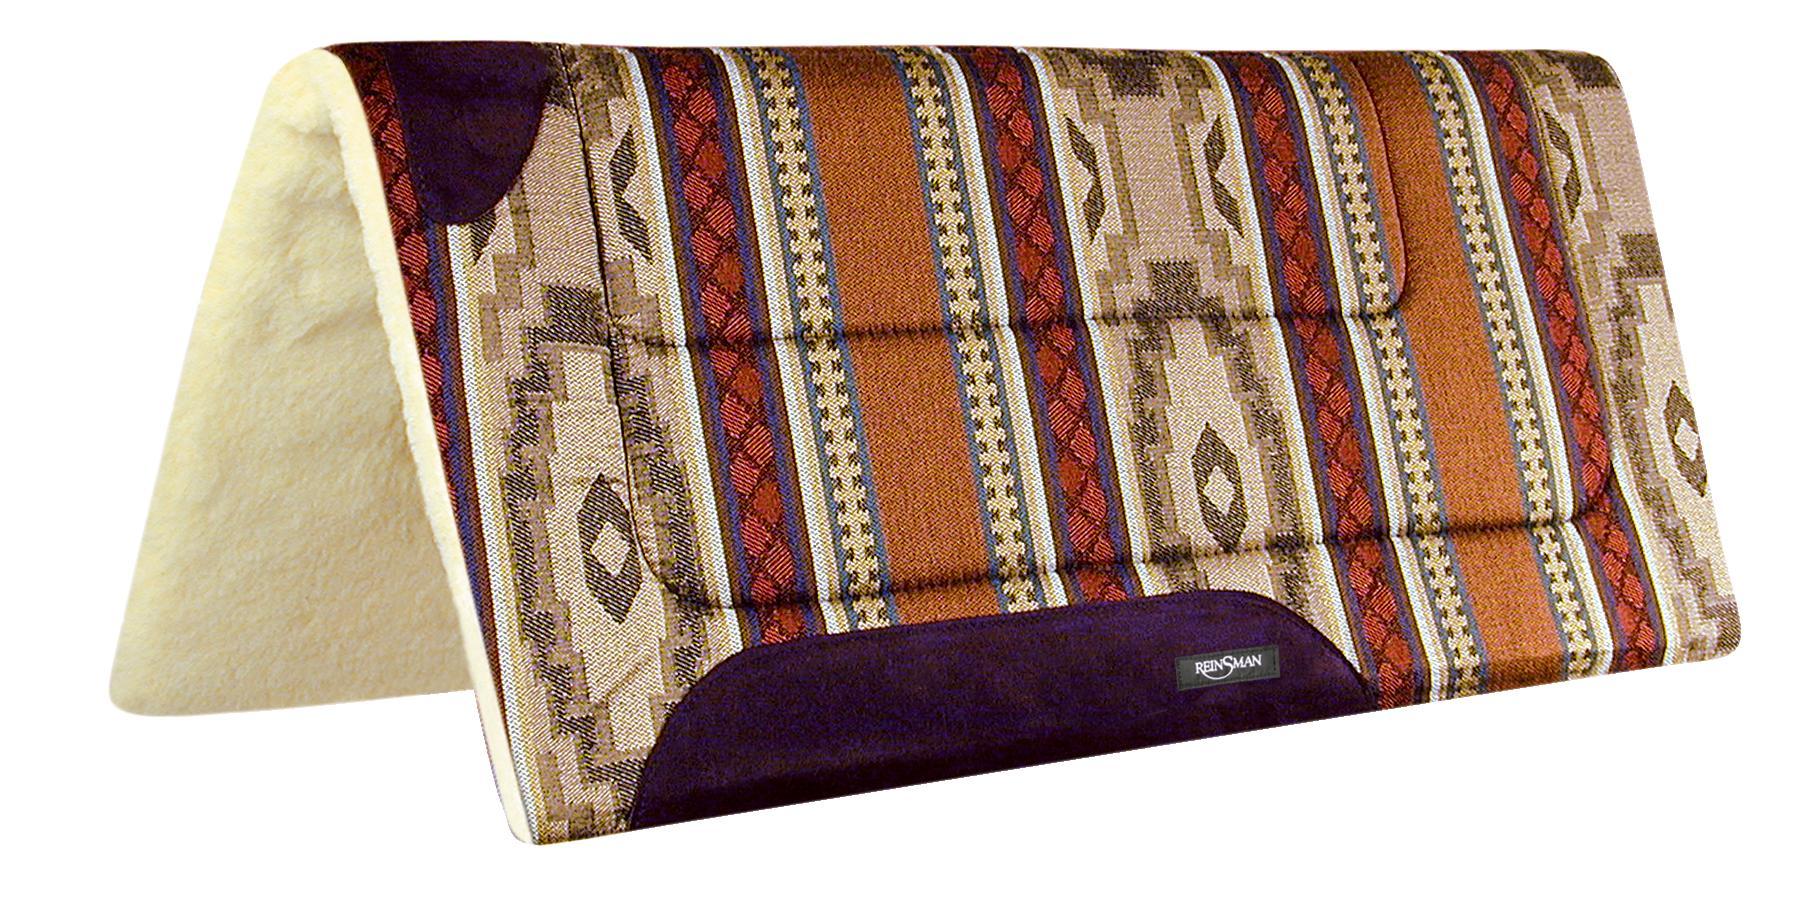 REINSMAN Square Herculon Pad - Fleece - Corral Beige Print